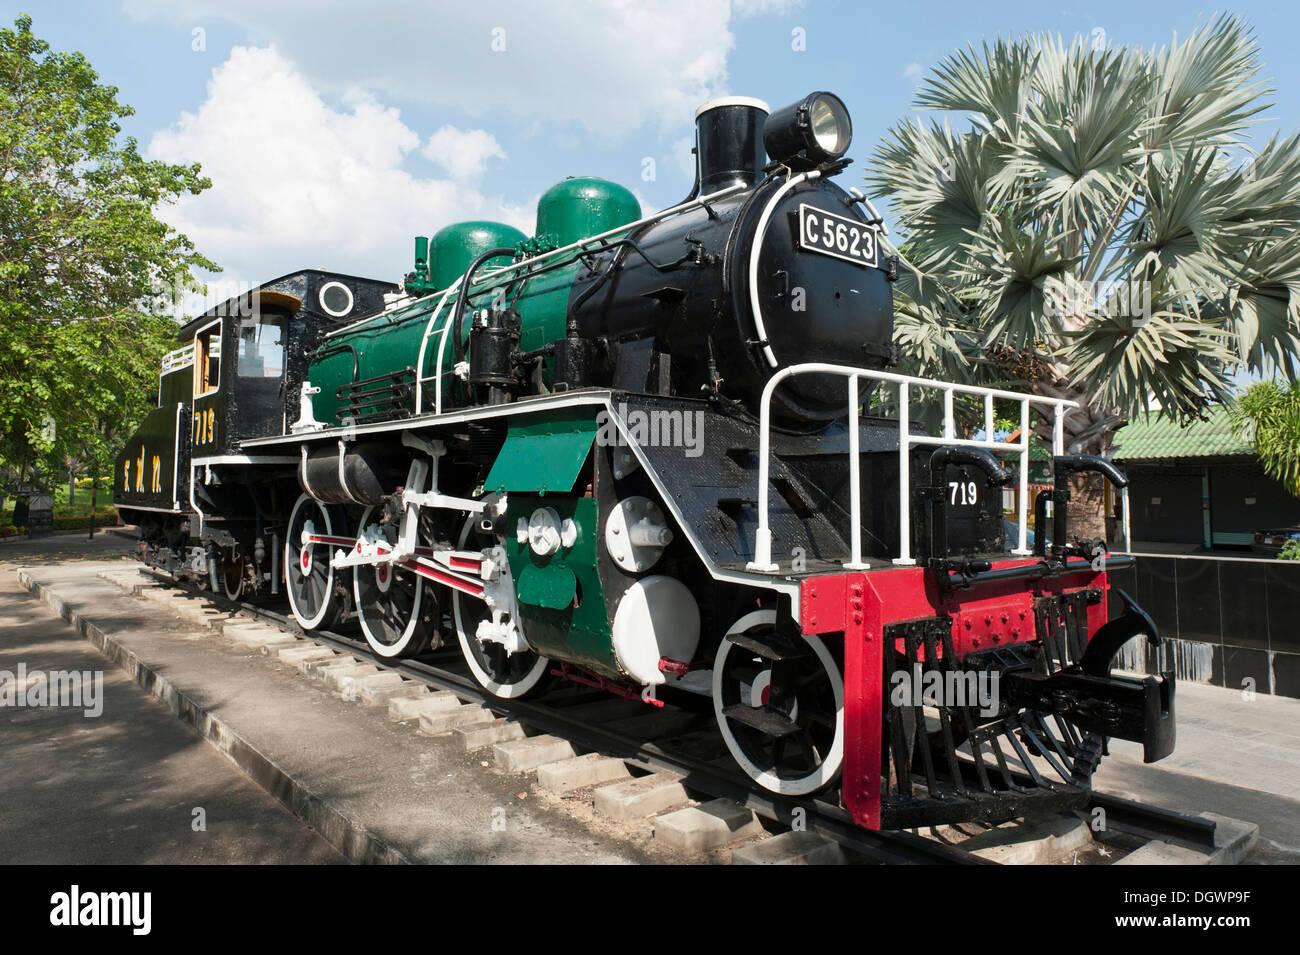 Steam locomotive at a museum, Kanchanaburi, Provinz Kanchanaburi, Thailand - Stock Image